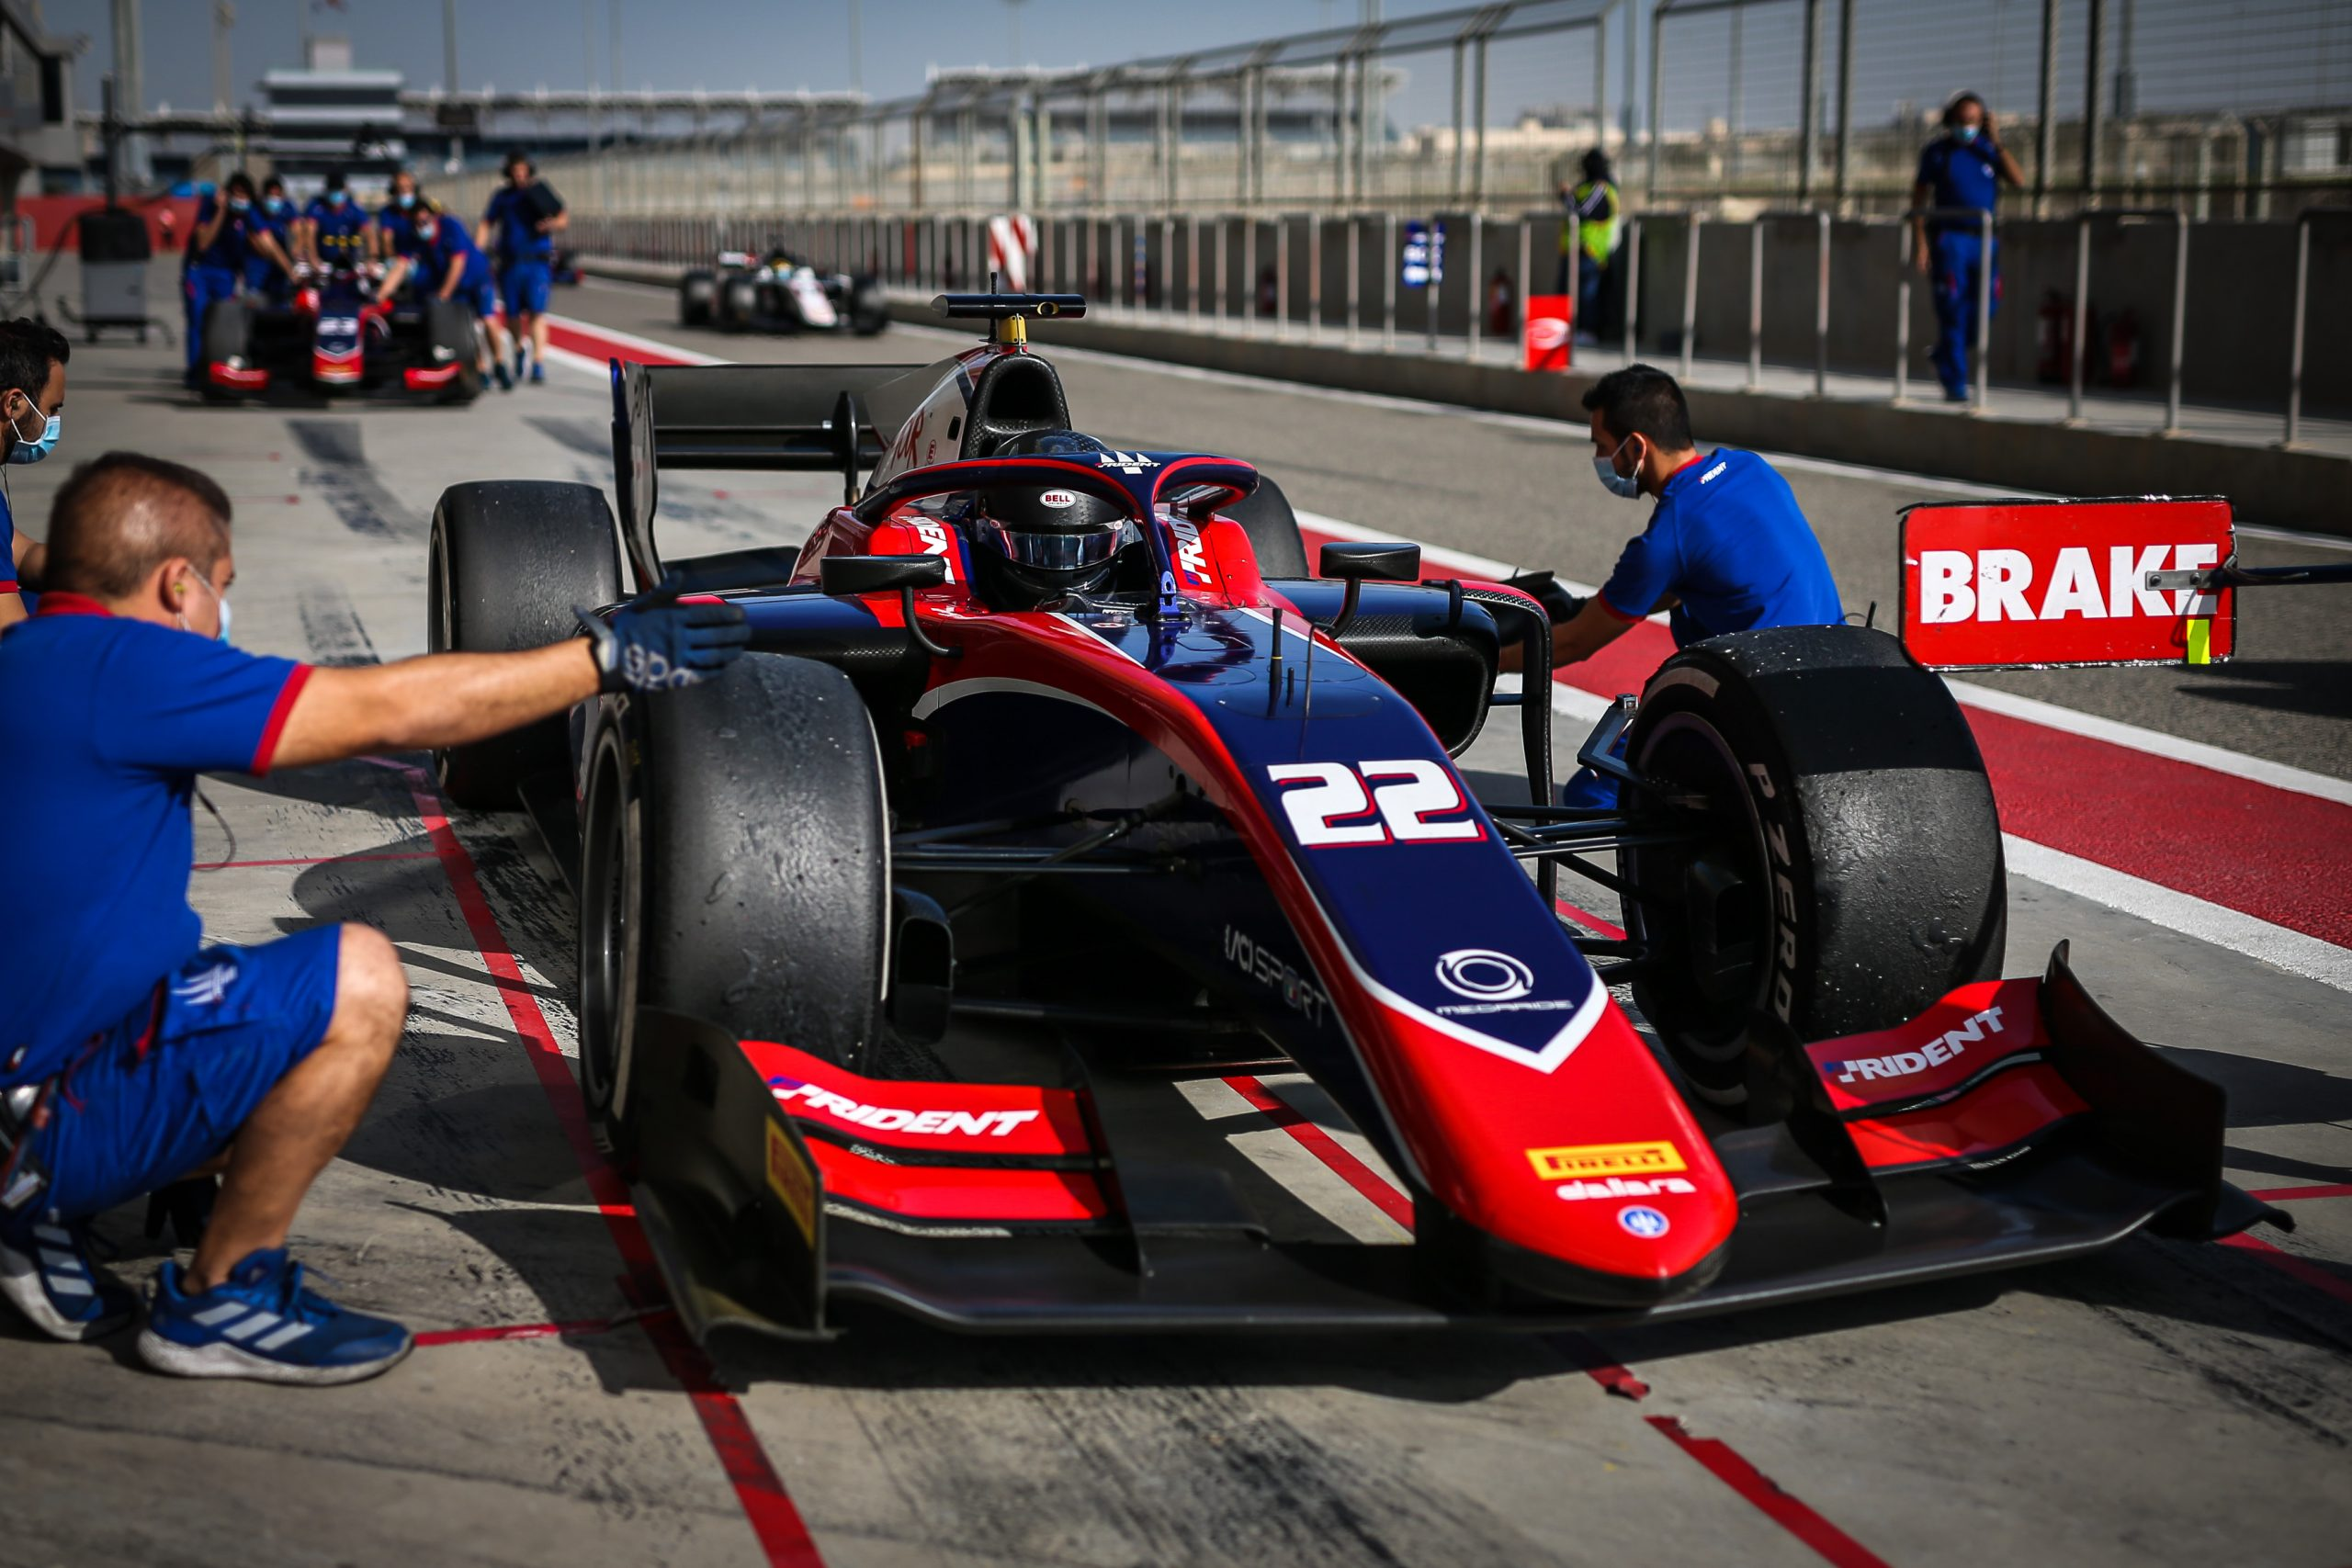 SAKHIR (BH), 8-10 December 2020: F2 Post season test at Bahrain International Circuit. Bent Viscaal #22 Trident. © 2020 Sebastiaan Rozendaal / Dutch Photo Agency